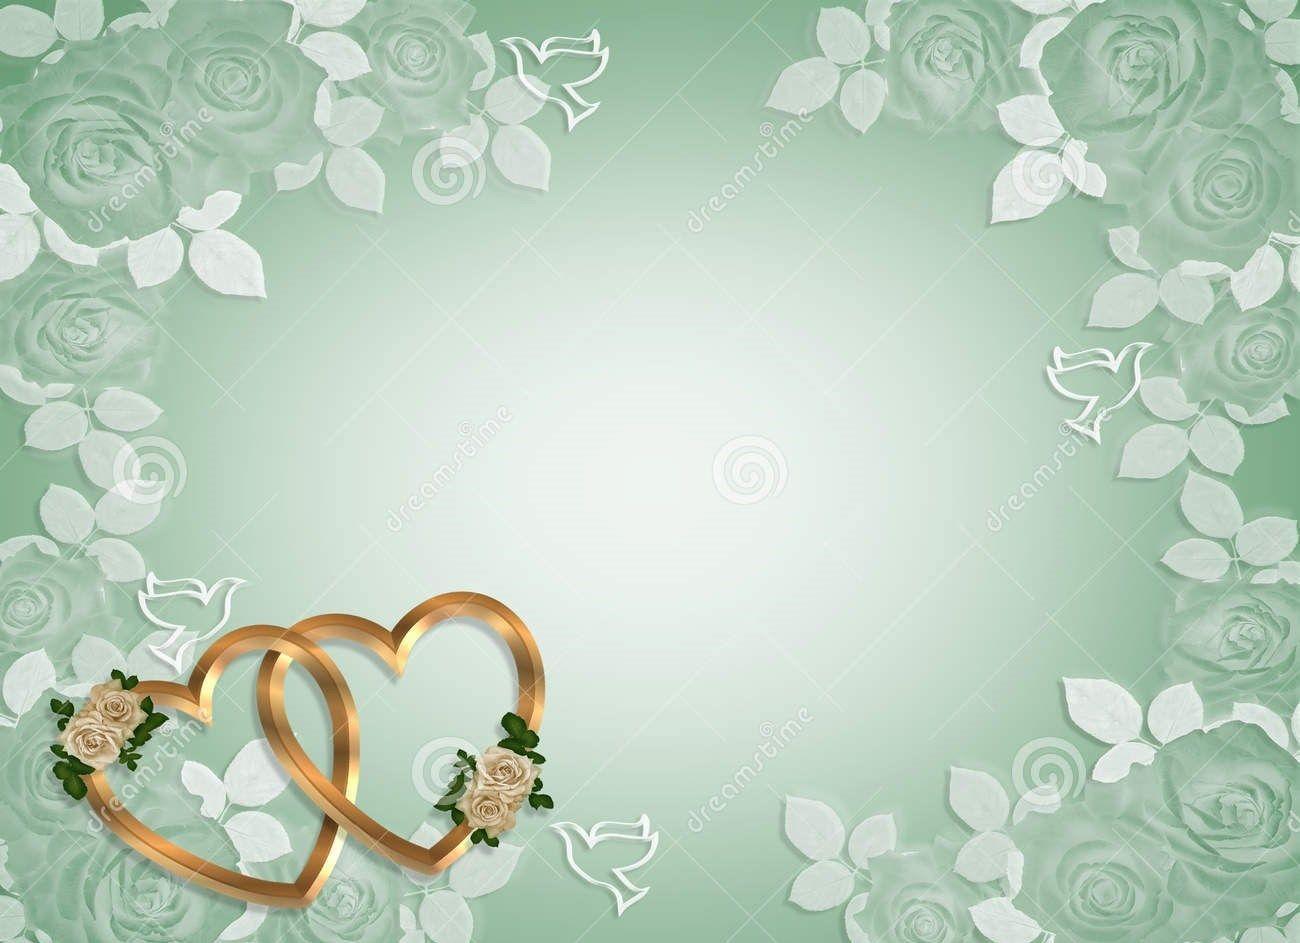 Wedding Invitation Design Templates Free Blank